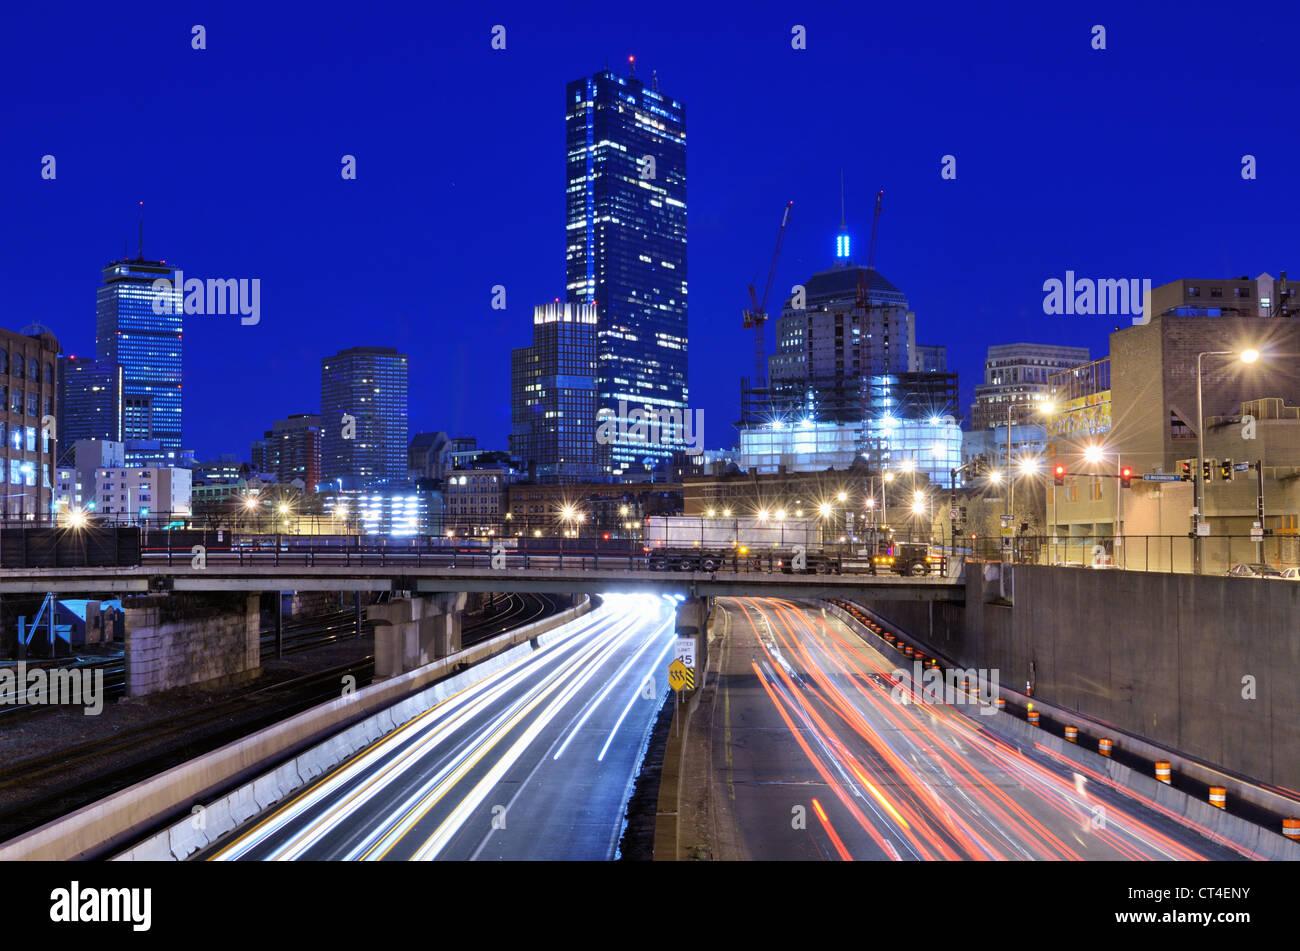 Boston skyline above the Massachusetts Turnpike - Stock Image